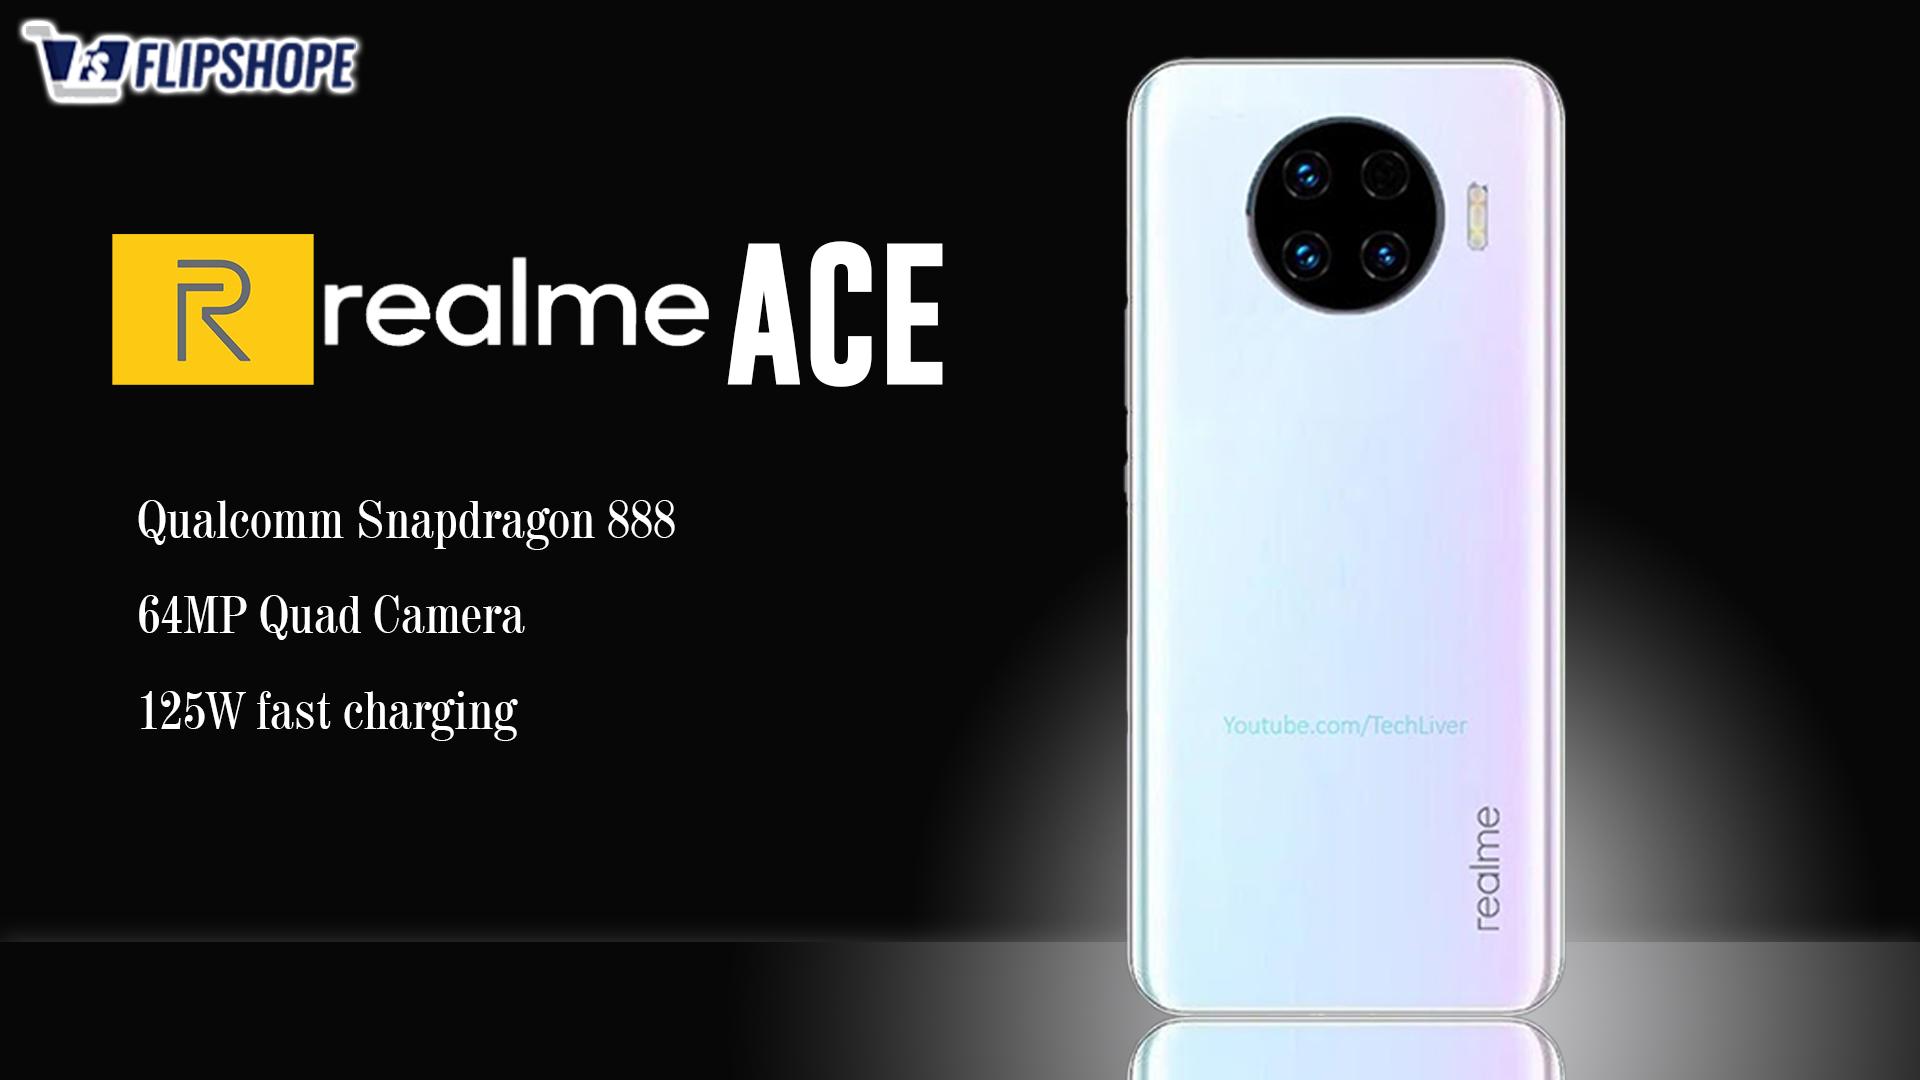 Realme ACE